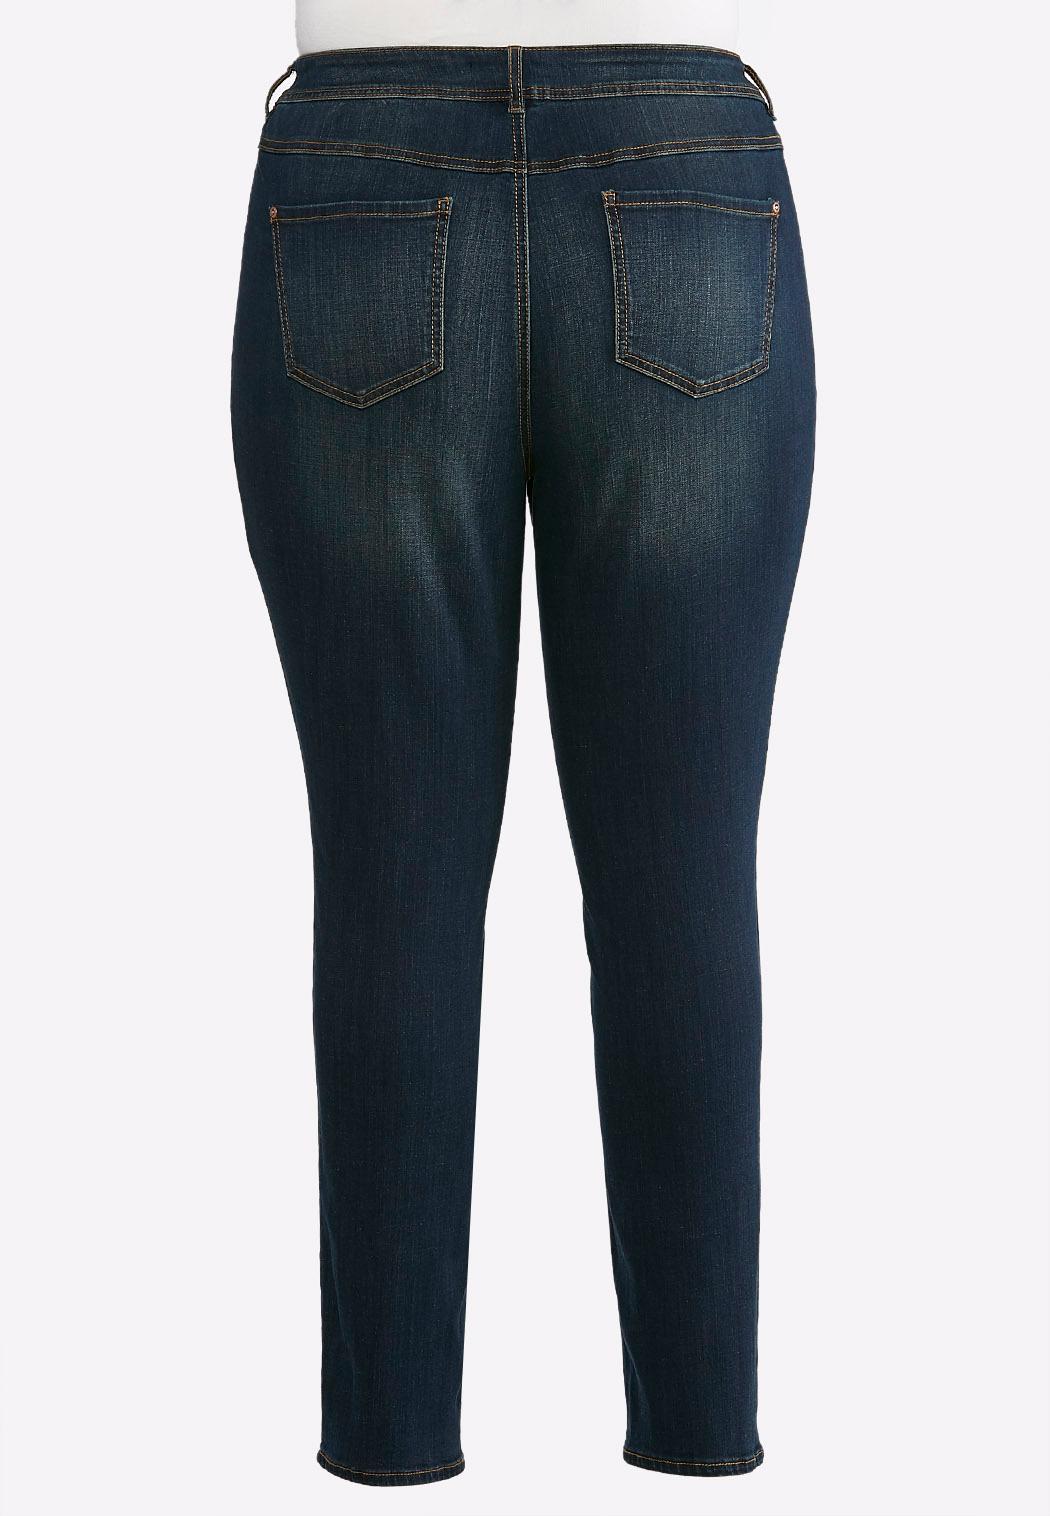 Plus Size Curvy Rinse Wash Skinny Jeans (Item #43536942)